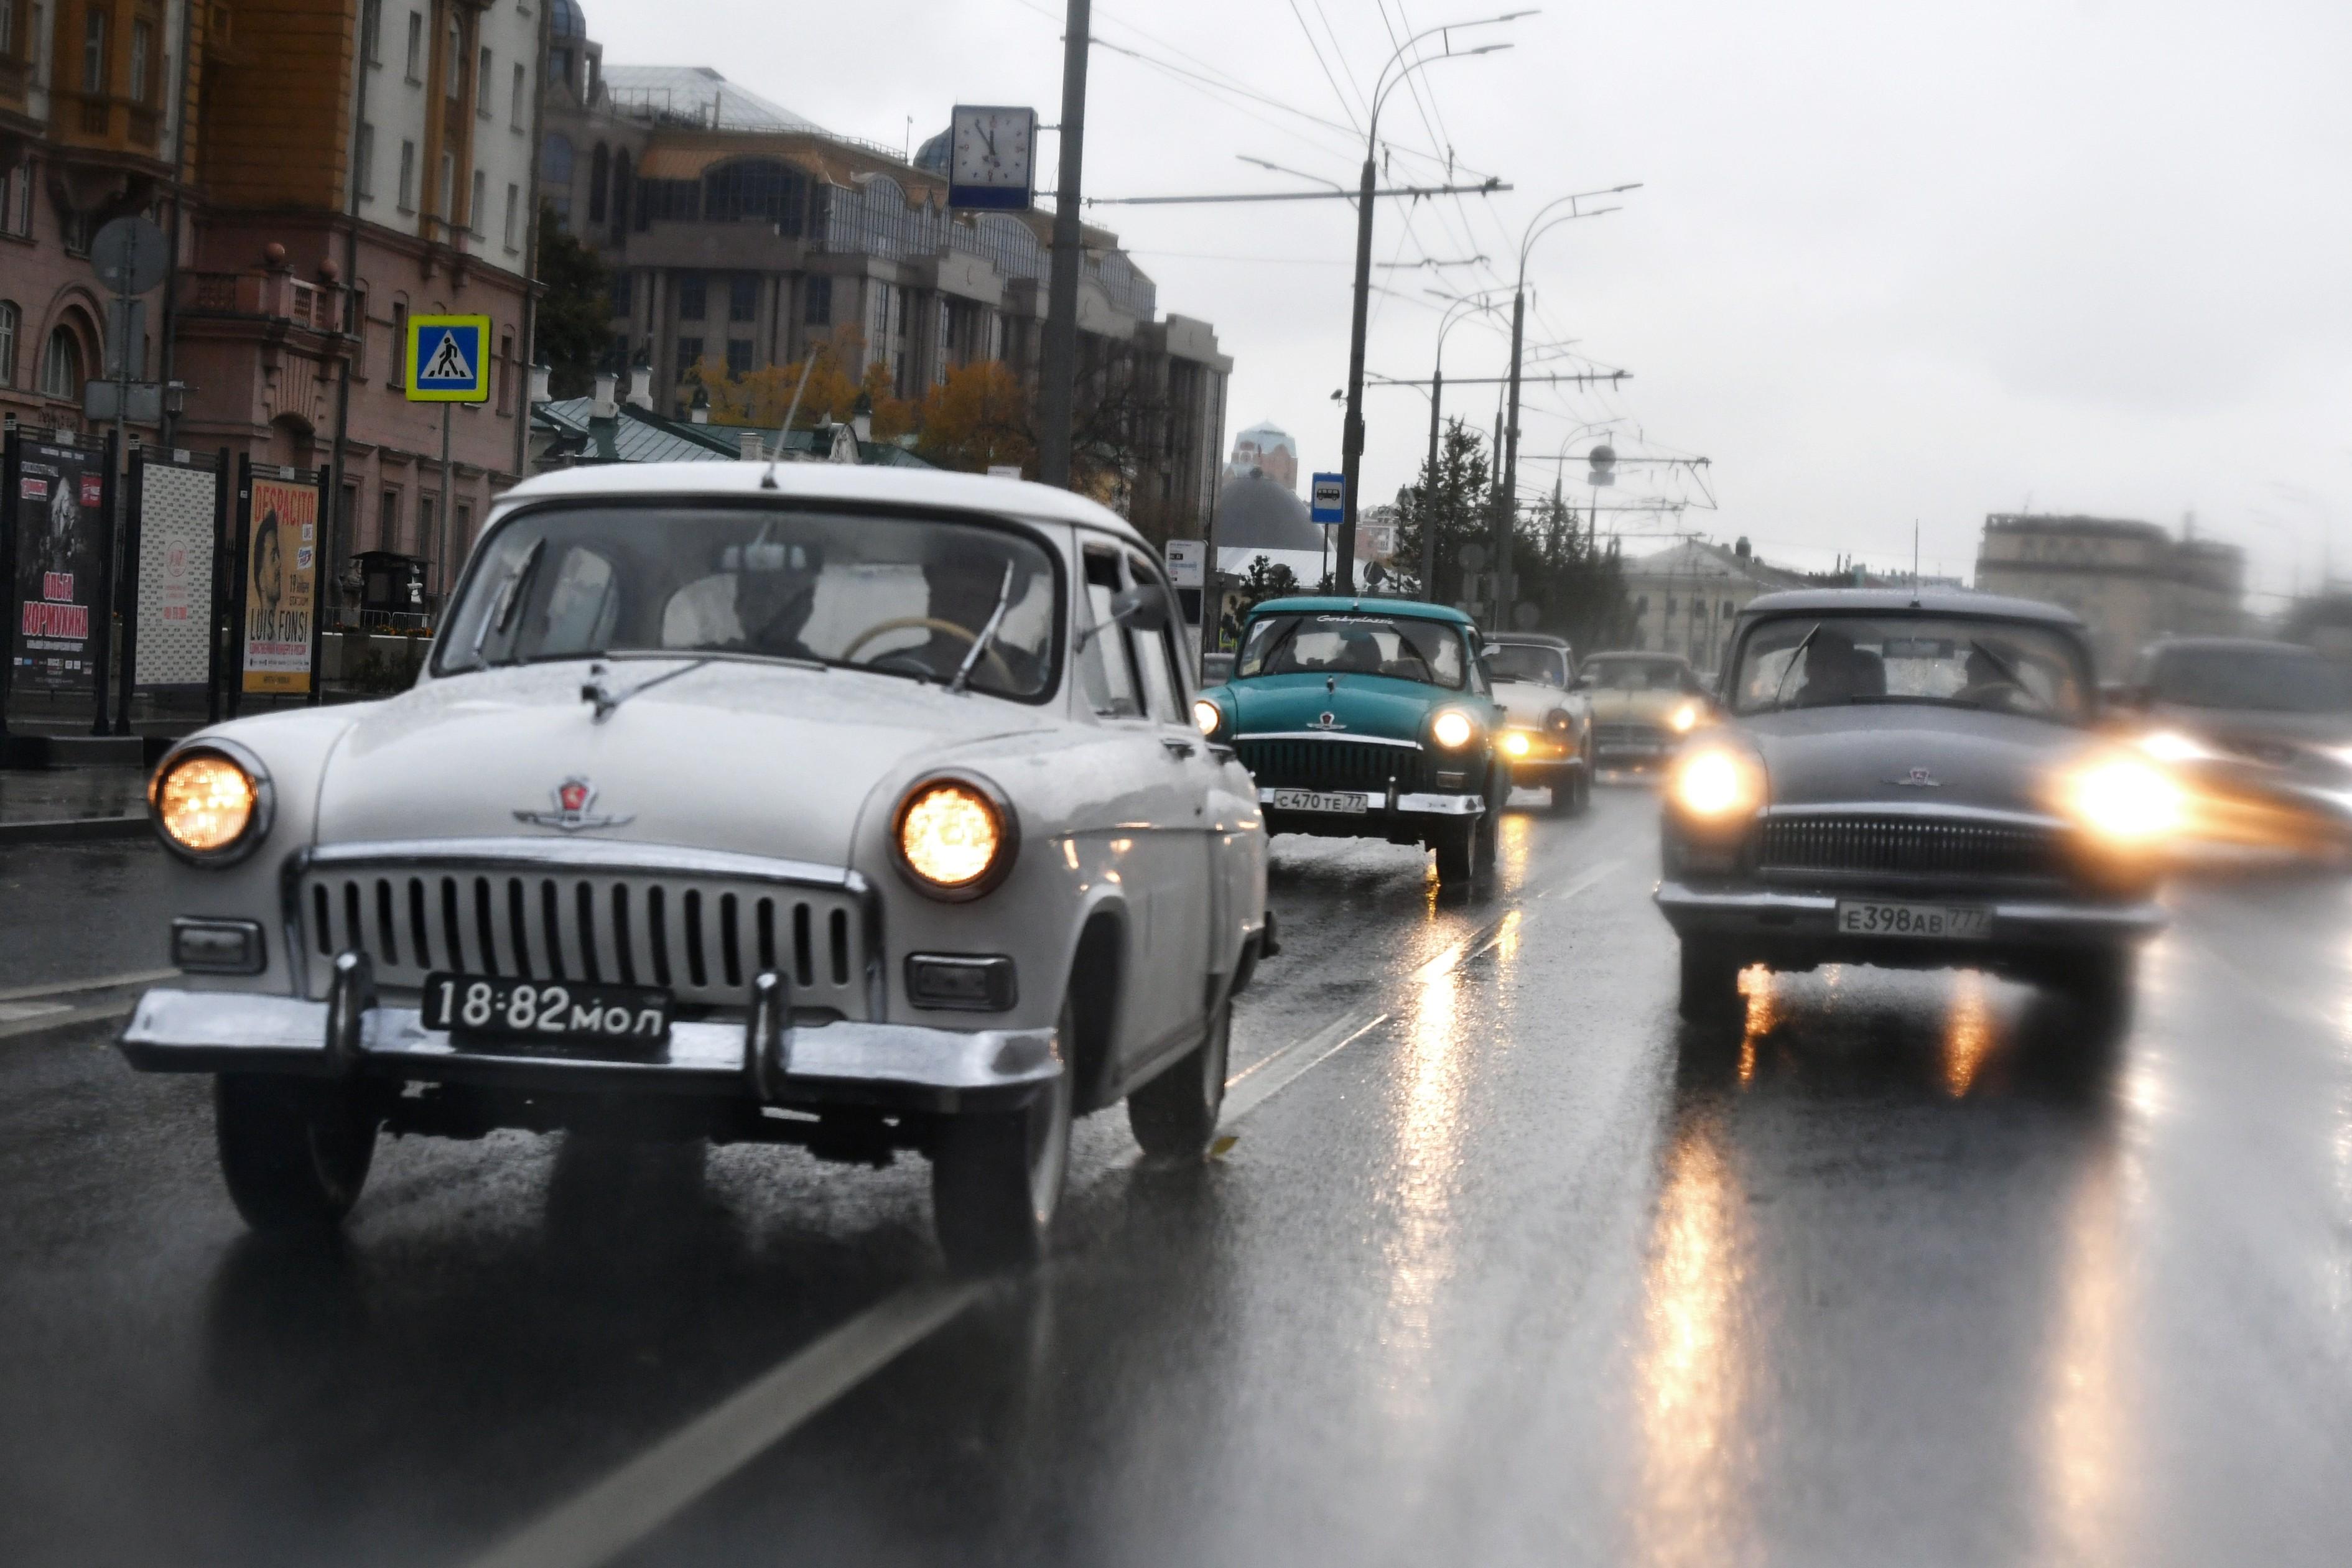 <p>Фото: &copy; РИА Новости/Михаил Воскресенский</p>